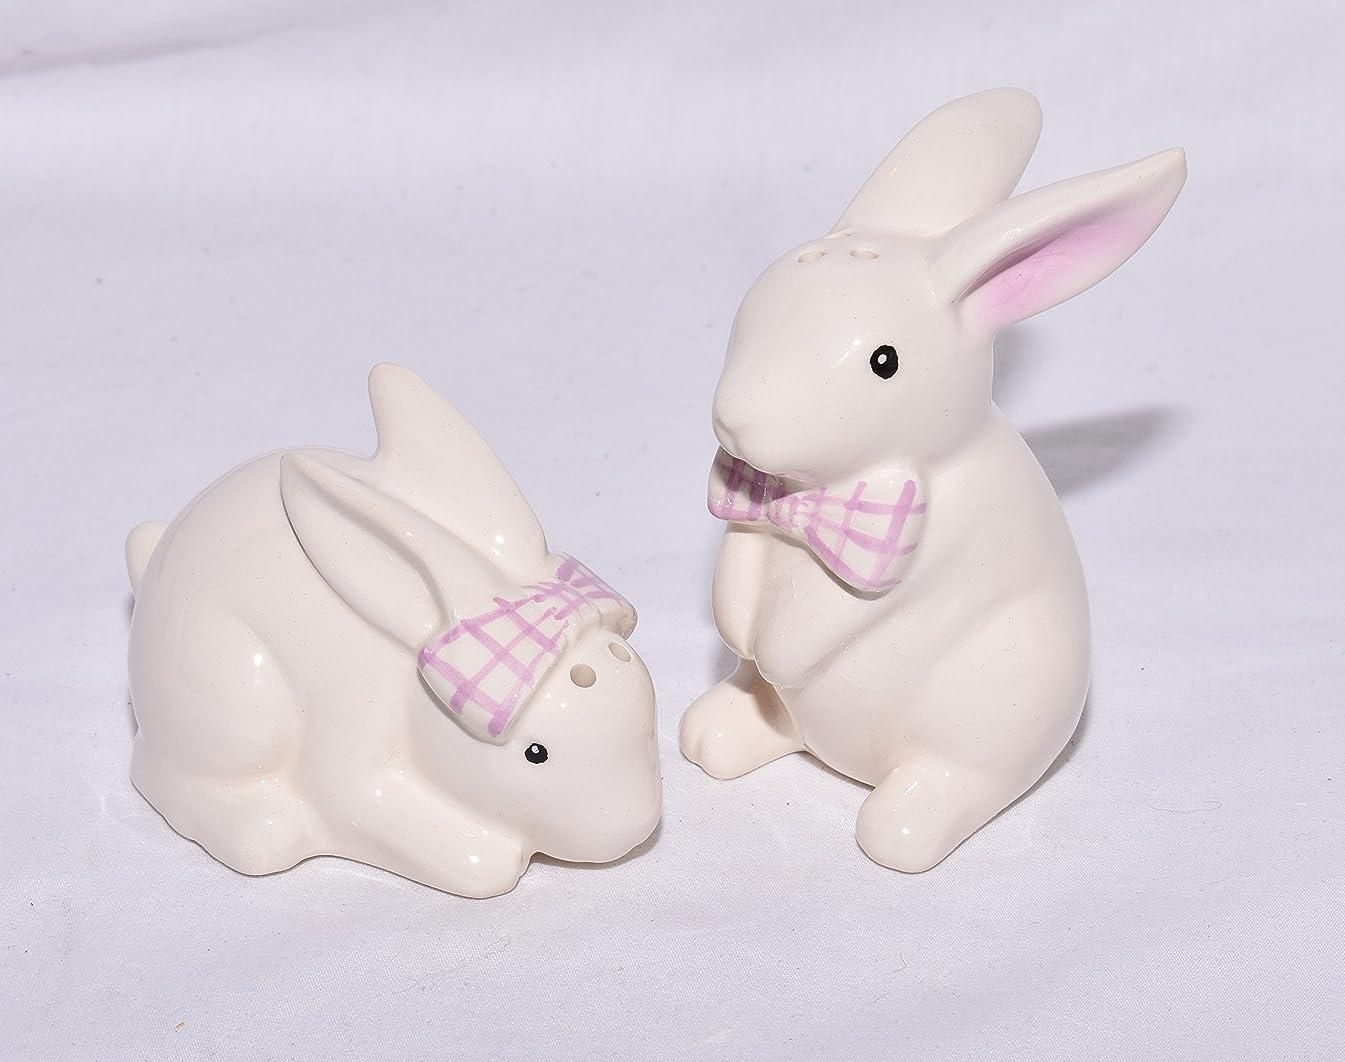 New Adorable White Bunny Rabbit Rabbits with Lavender Bow Tie Decorative Salt & Pepper Shaker Set